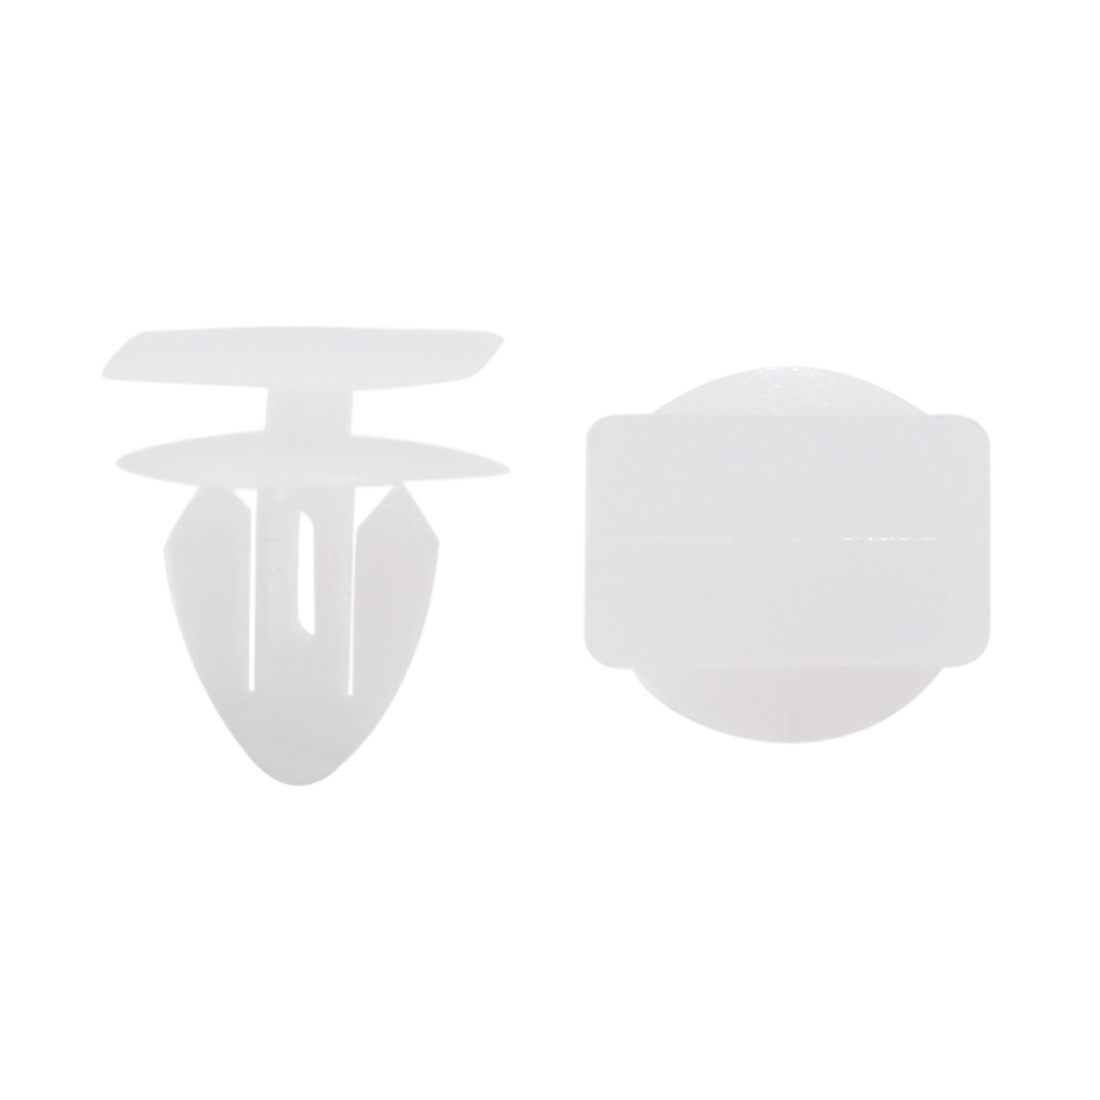 100pcs Plastic Rivets Fastener Car Auto Fender Fixing Clips White Fits 11mm Hole